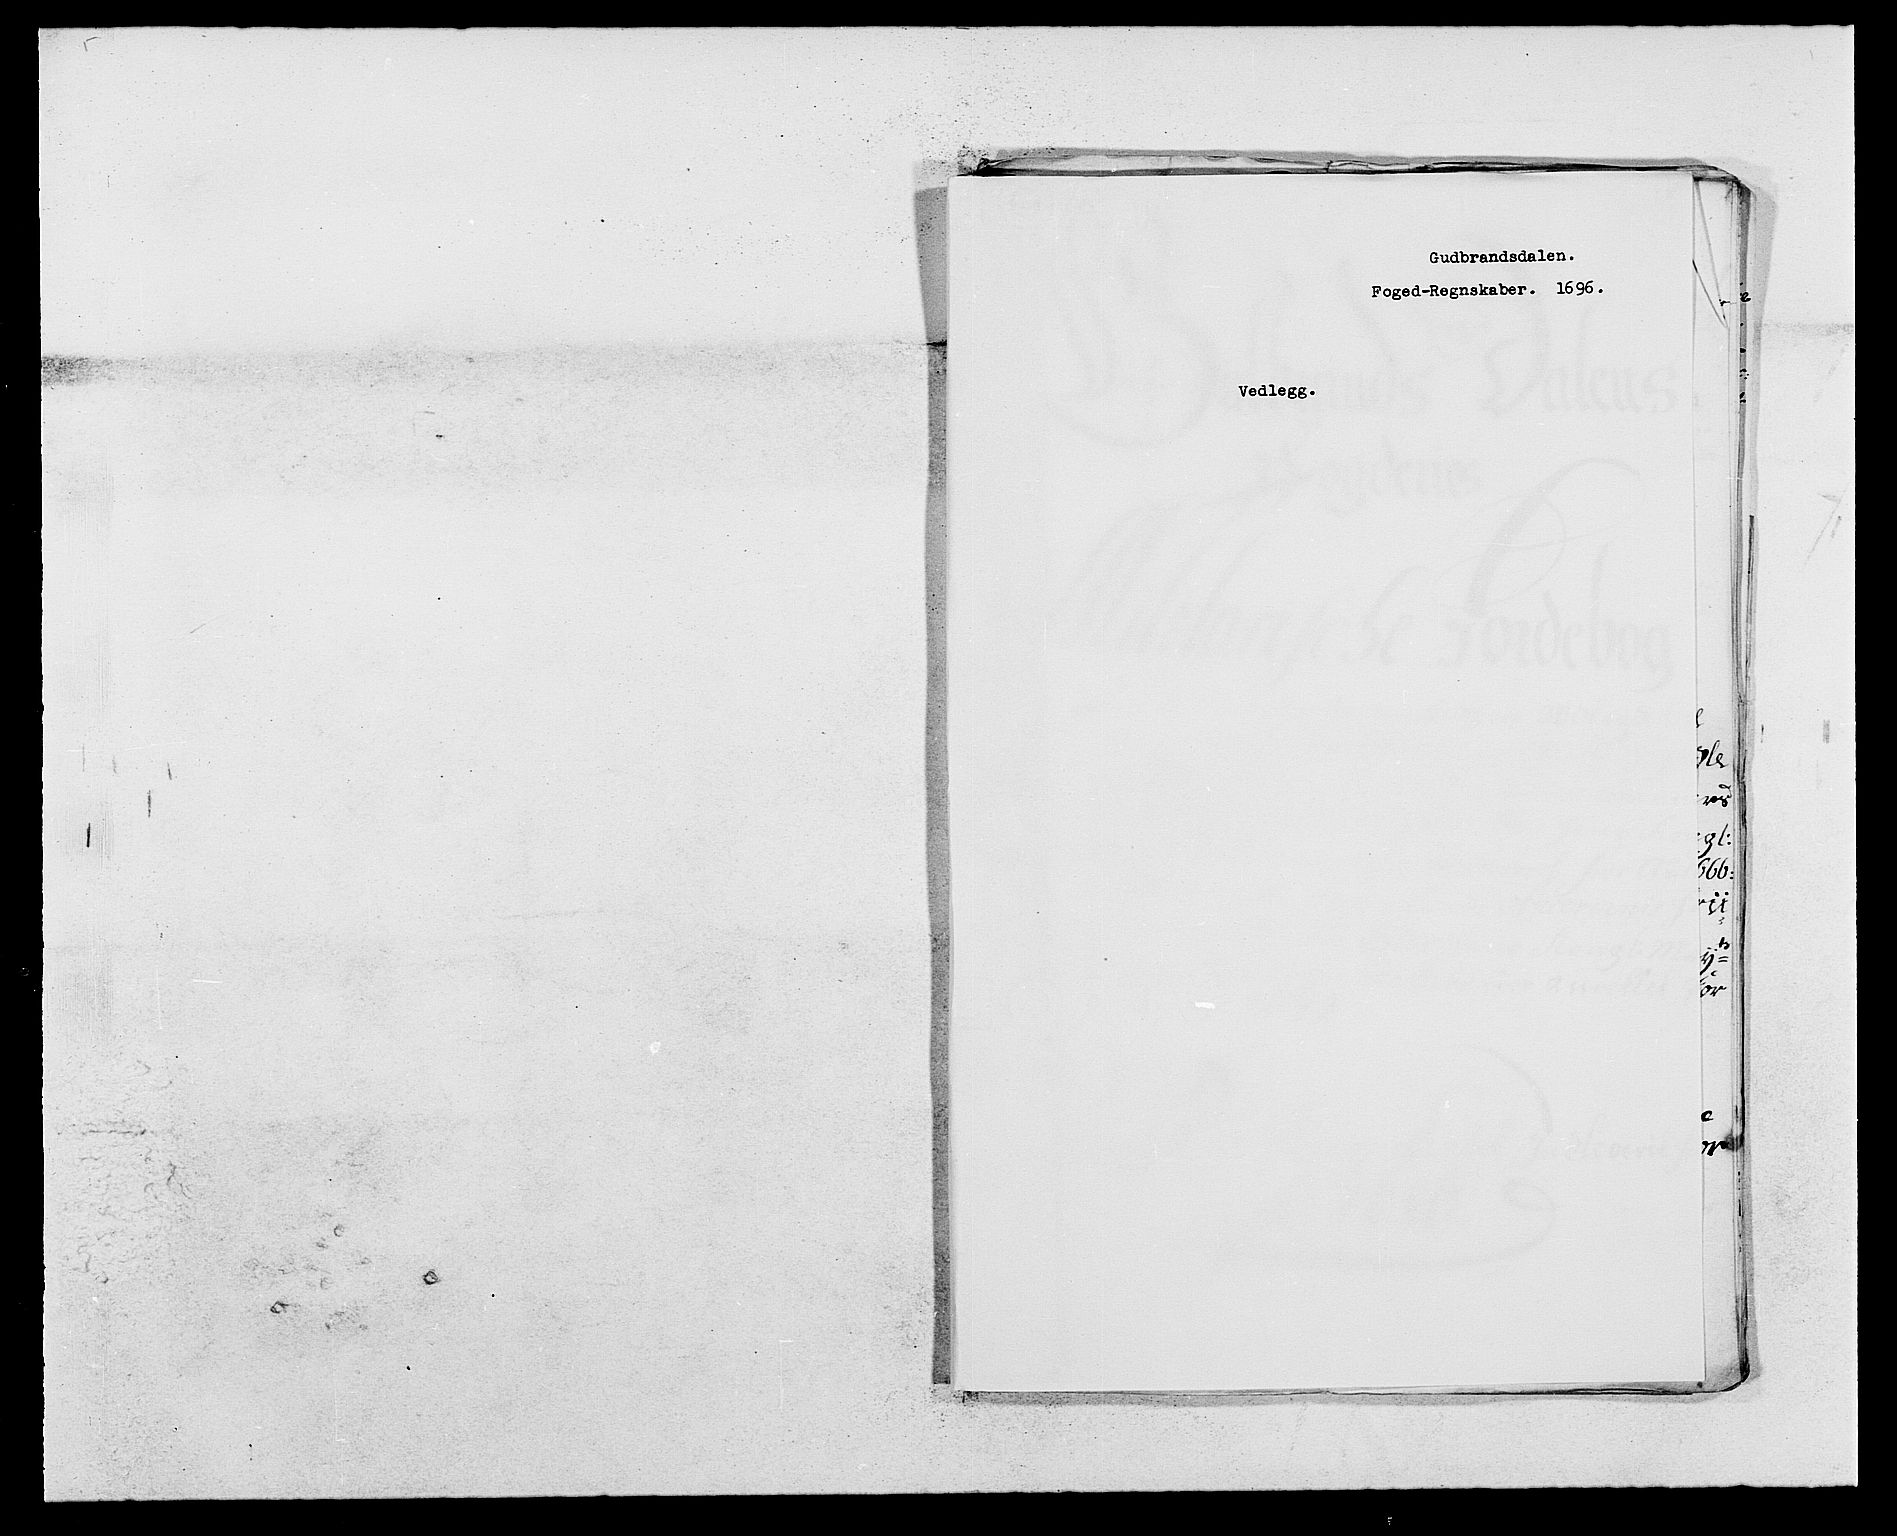 RA, Rentekammeret inntil 1814, Reviderte regnskaper, Fogderegnskap, R17/L1161: Fogderegnskap Gudbrandsdal, 1682-1689, s. 279